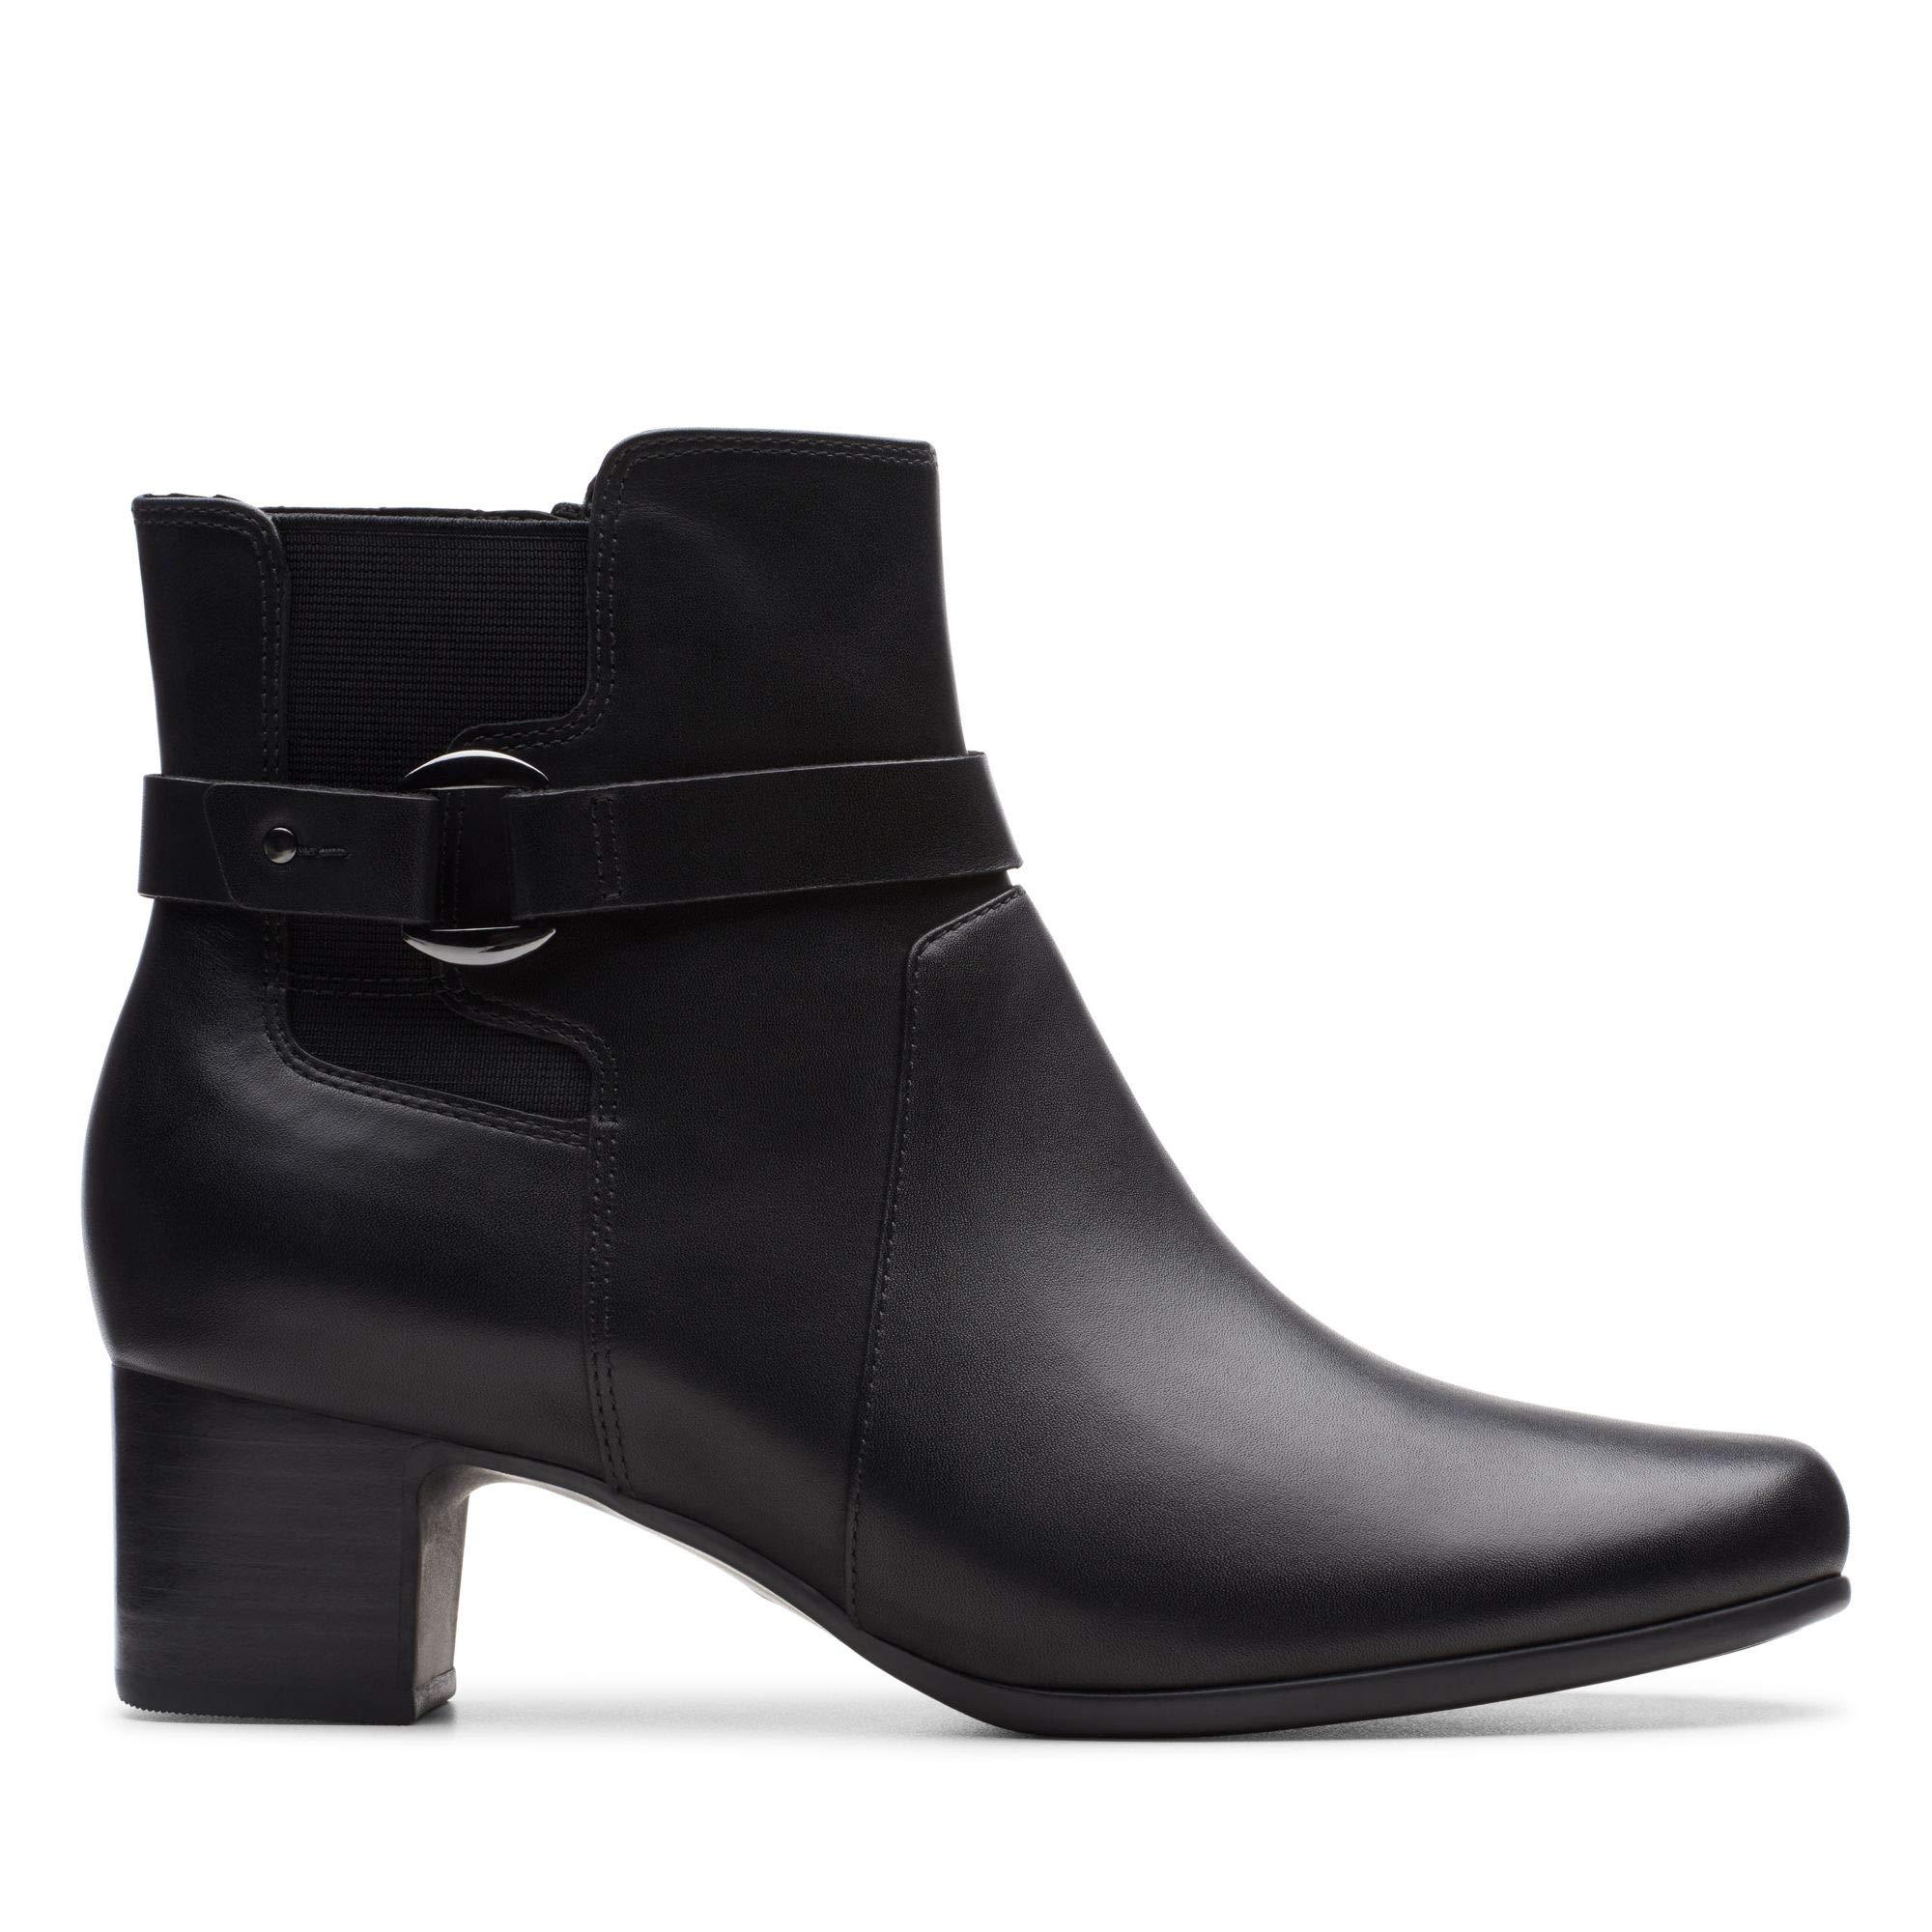 Leather35 Damson 5 Un Clarks FemmeNoir Black MidBotines Eu rCBQdxeoW